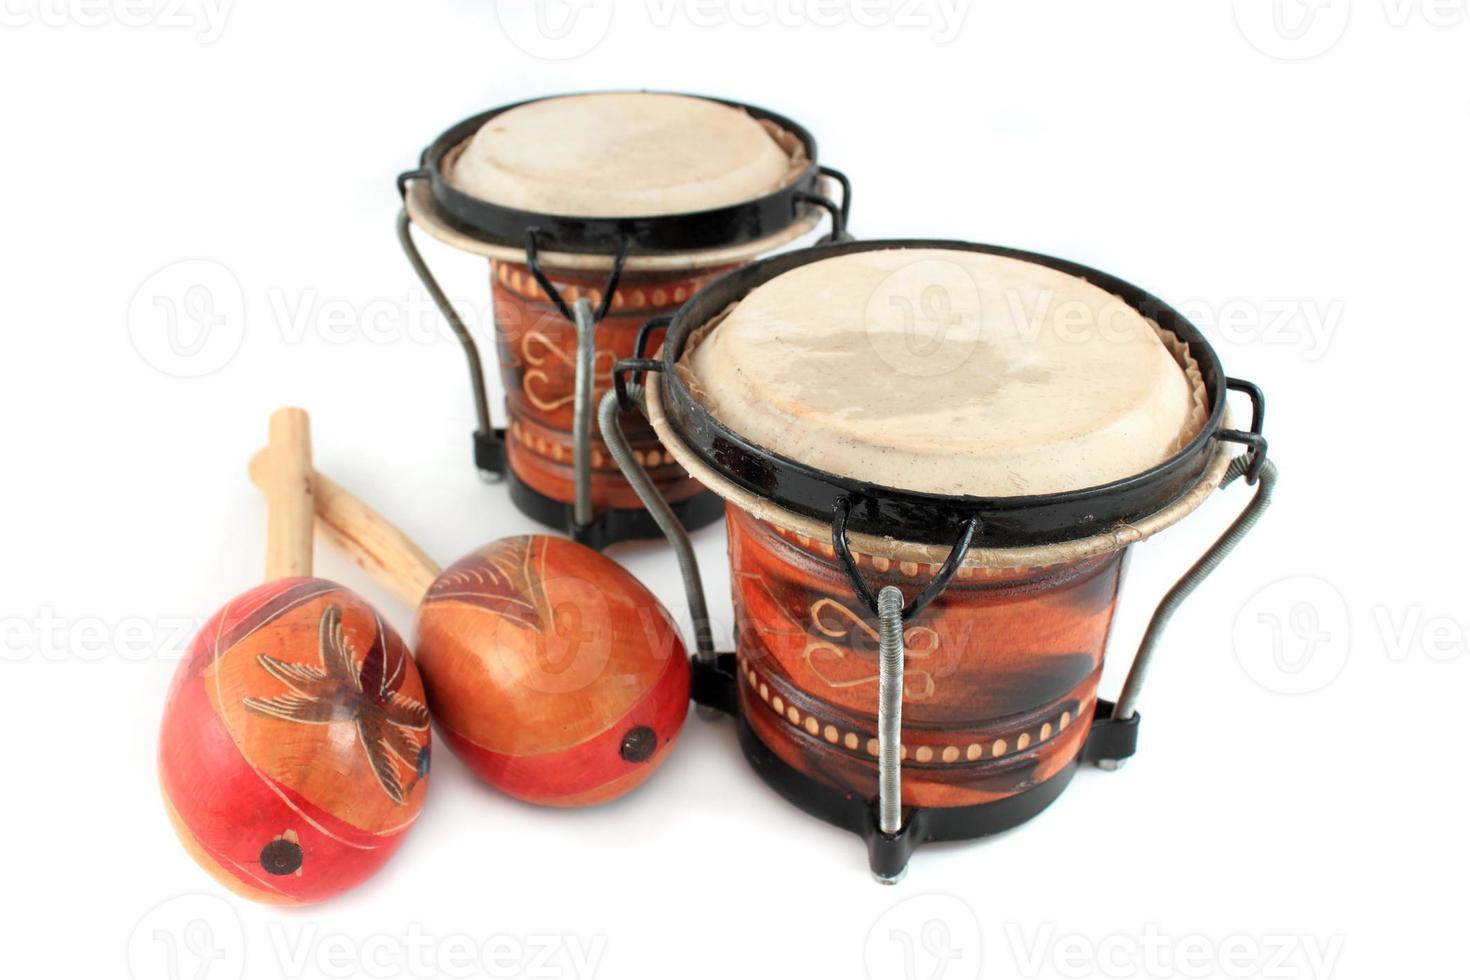 instruments rythmiques photo